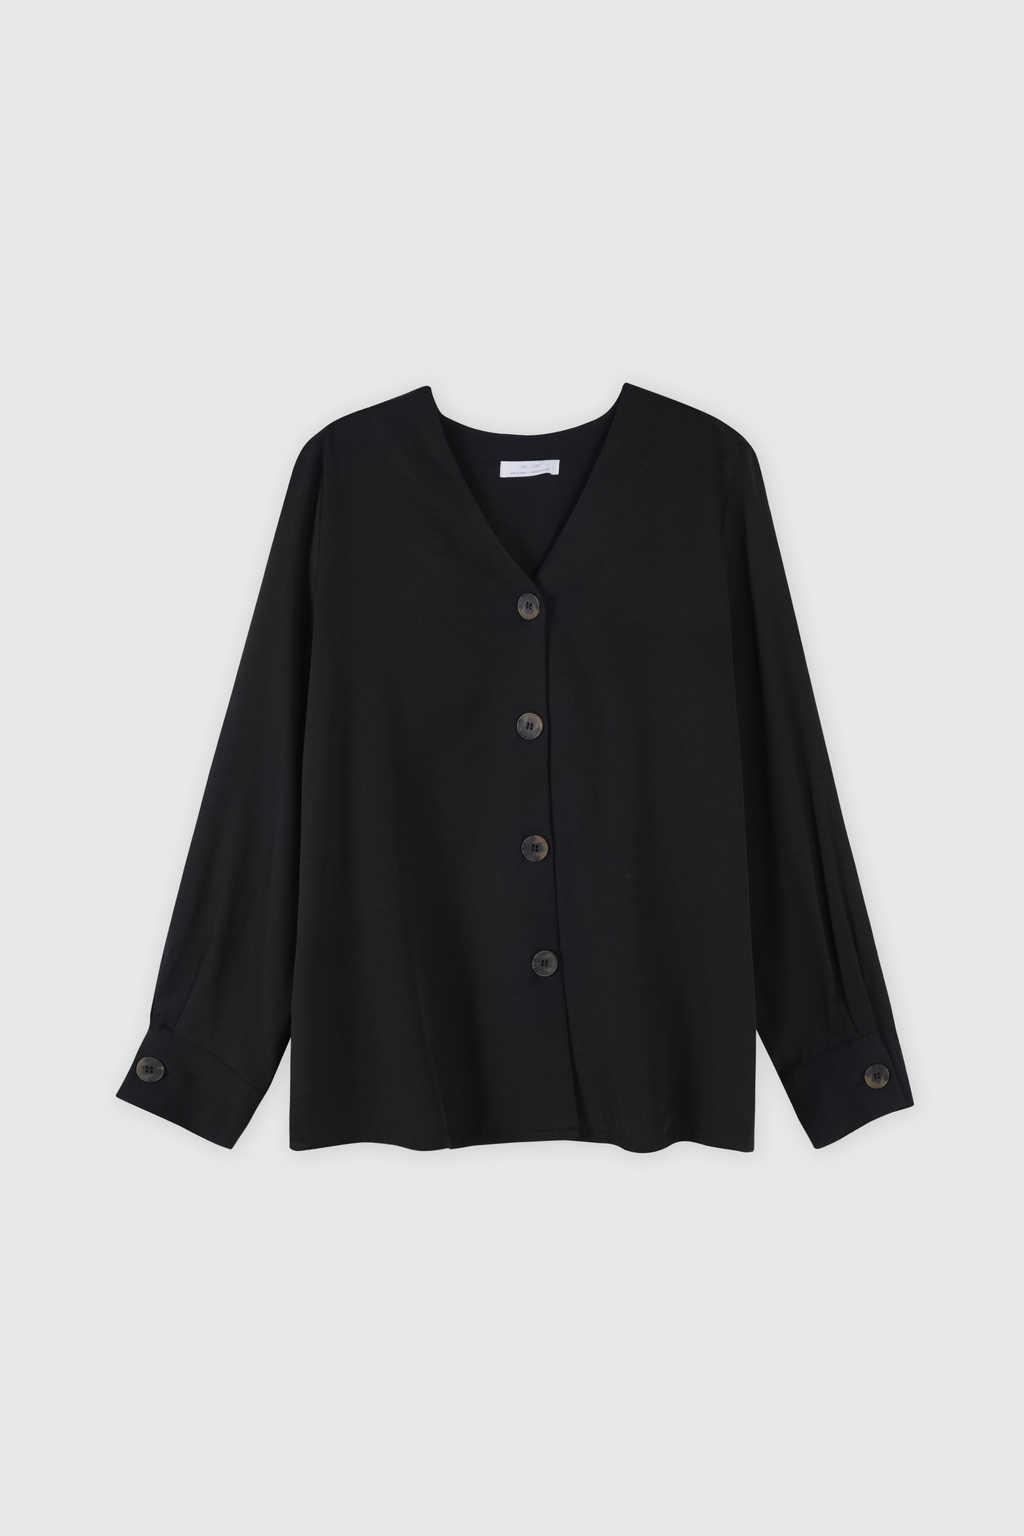 Blouse 2957 Black 9